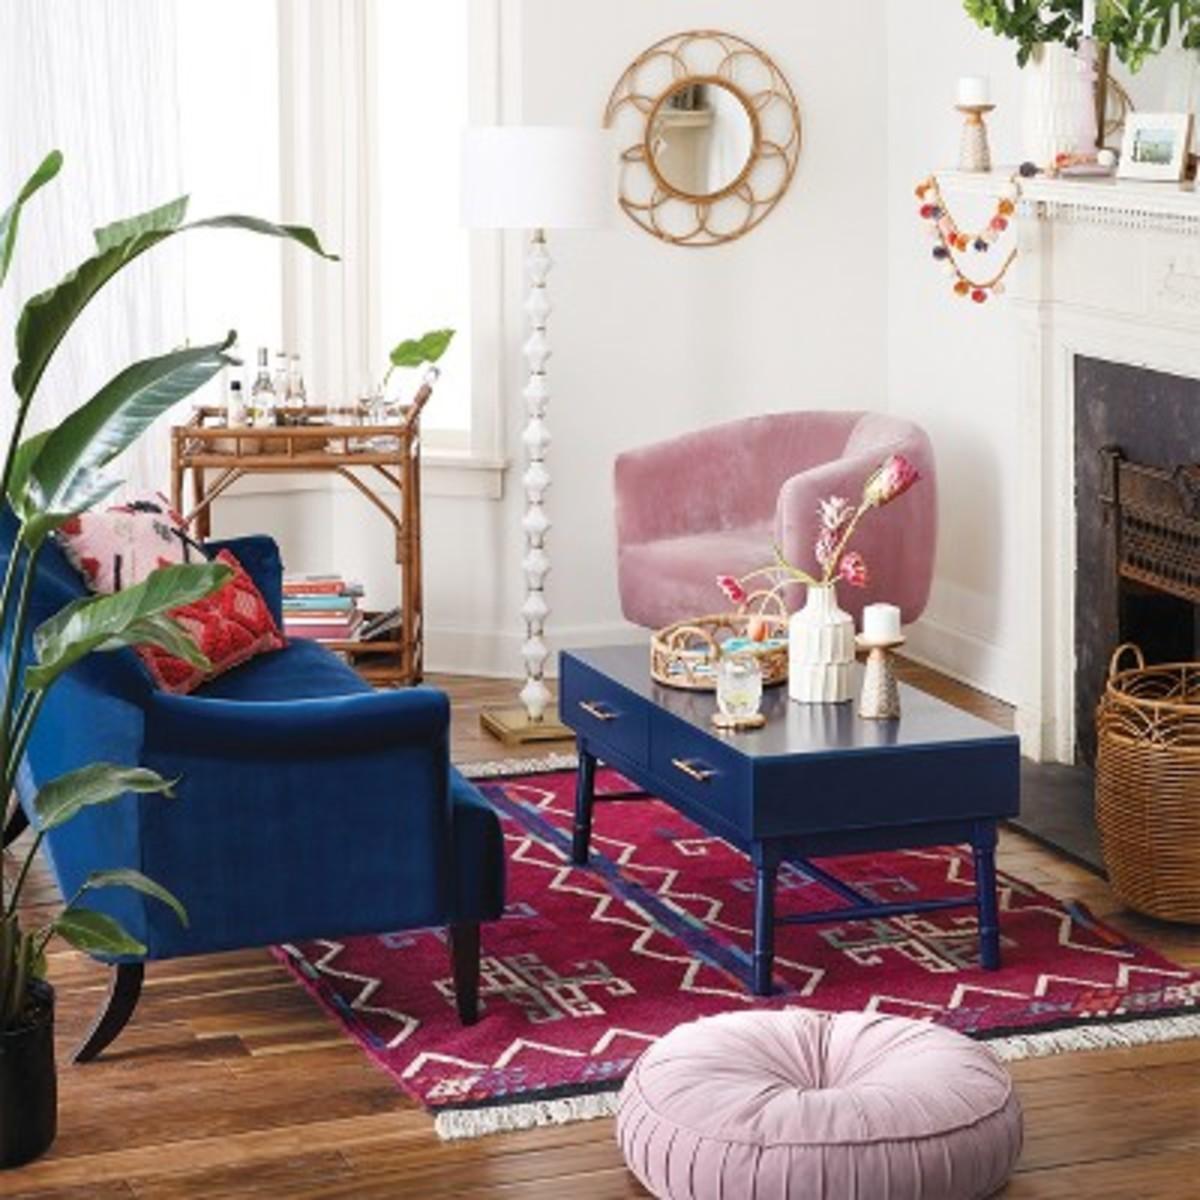 2019 Home Décor Trends